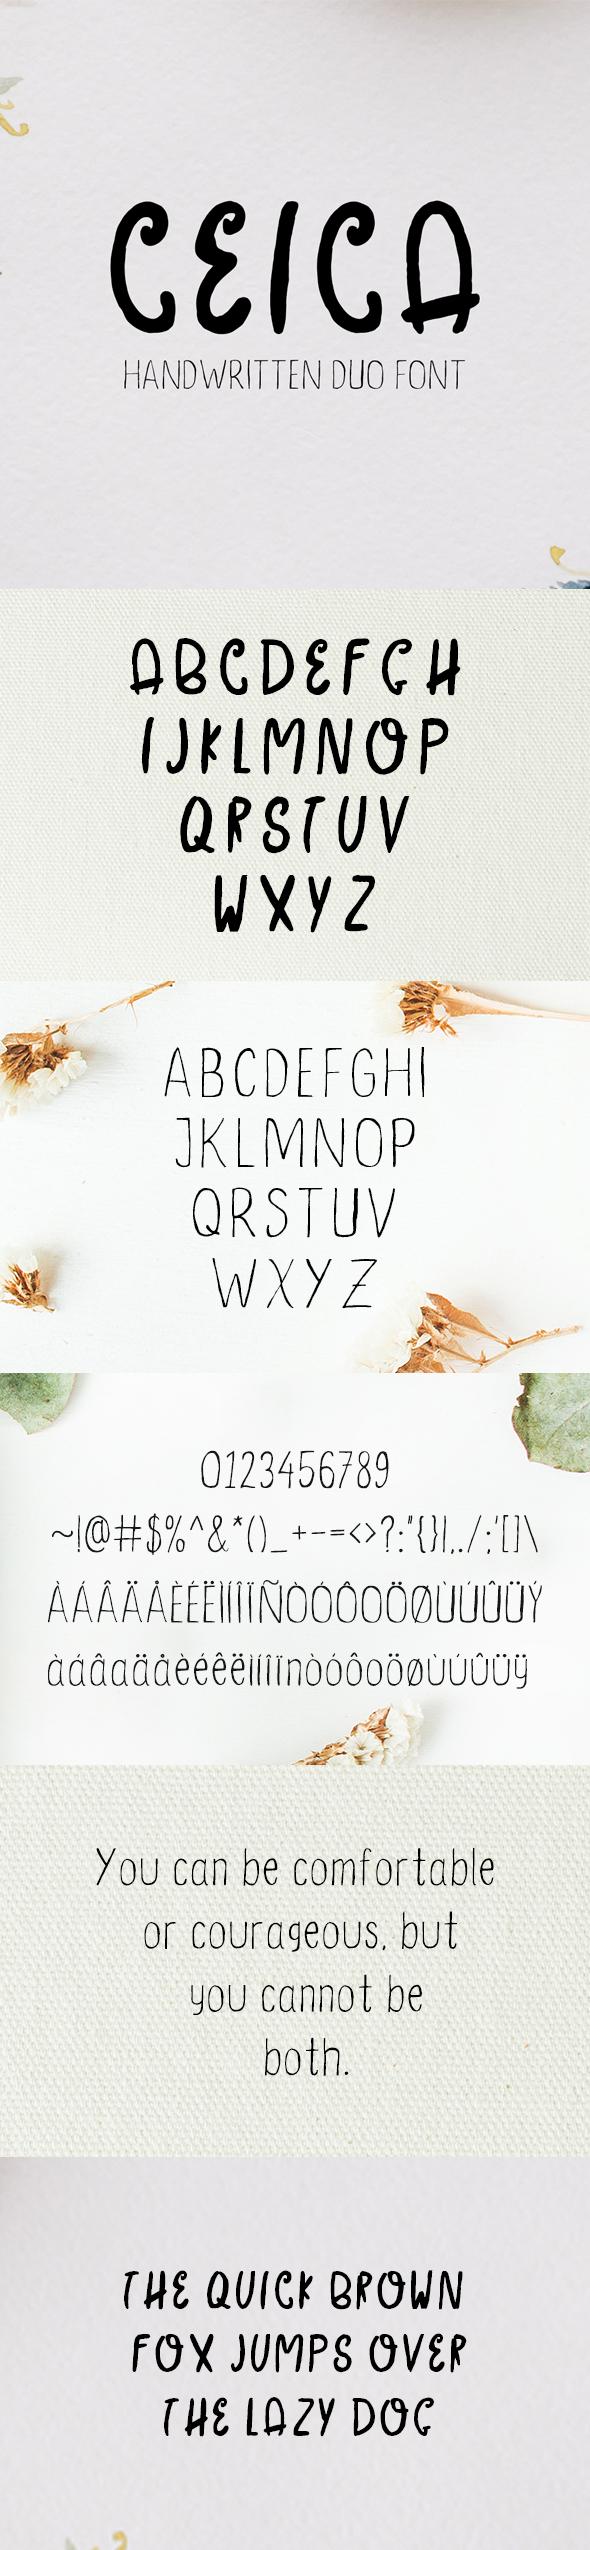 GraphicRiver Ceica Handwritten Duo Font 20917614